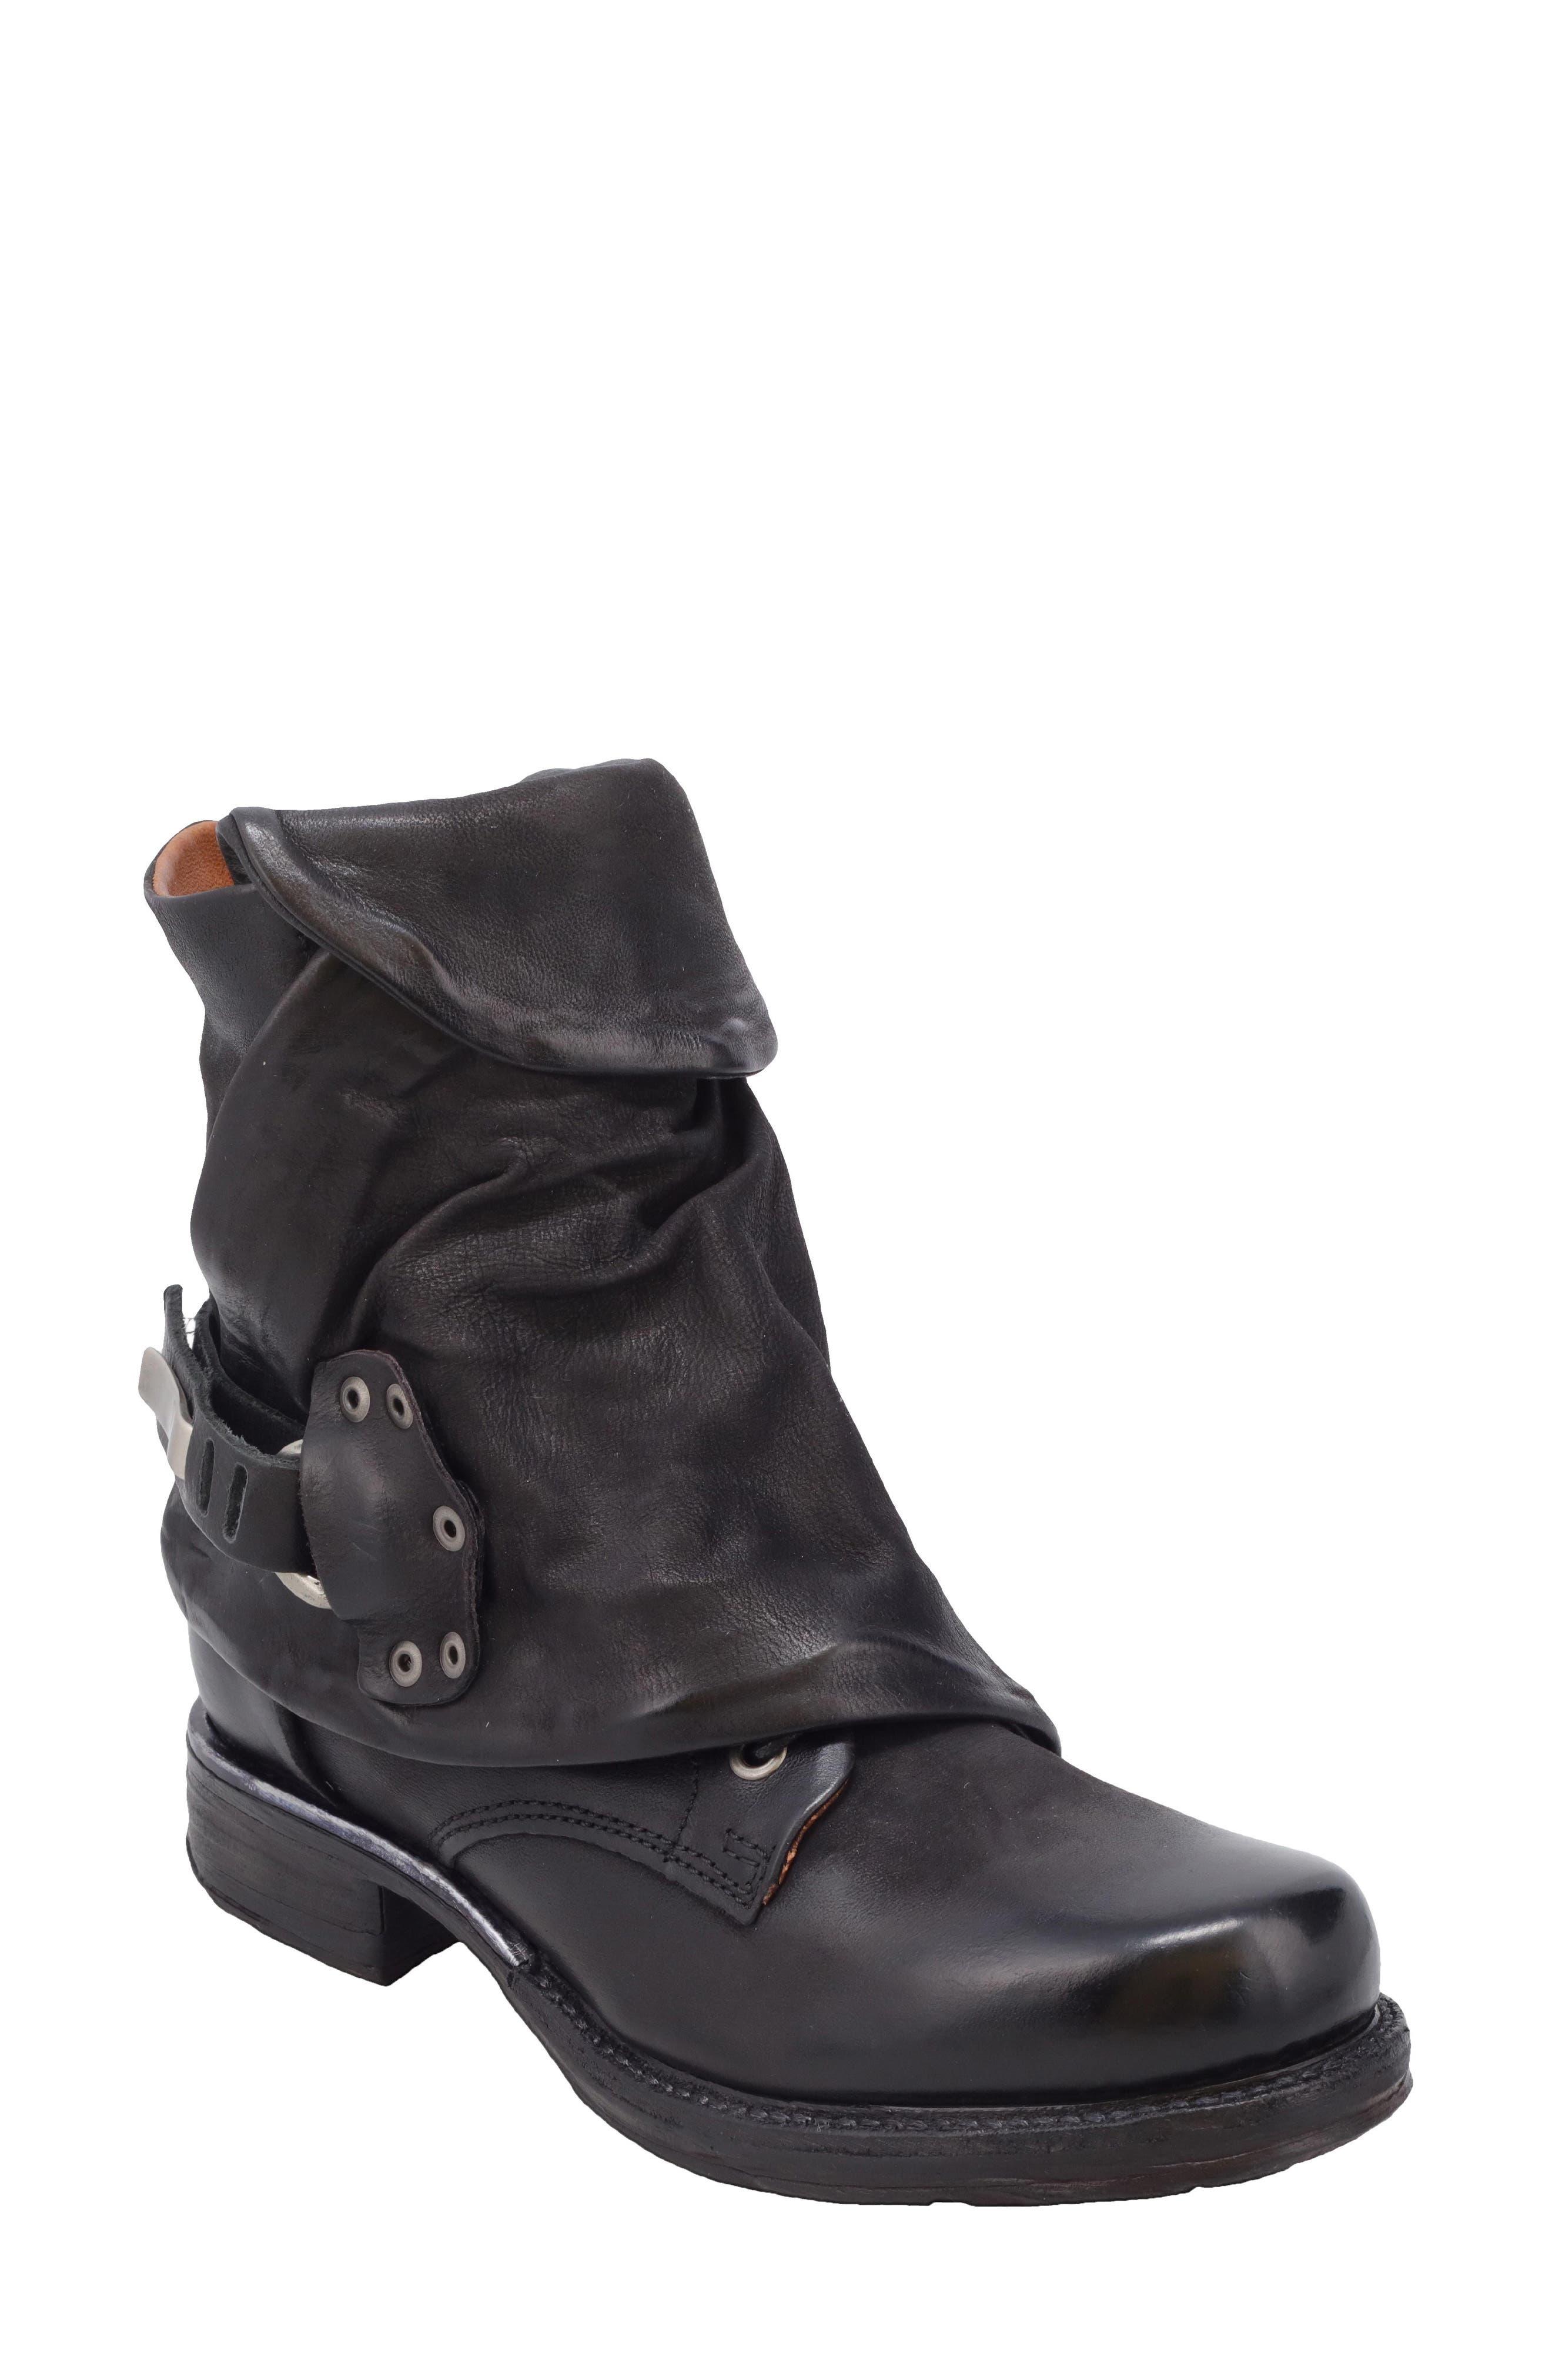 Women's A.s.98 Emerson Engineer Boot